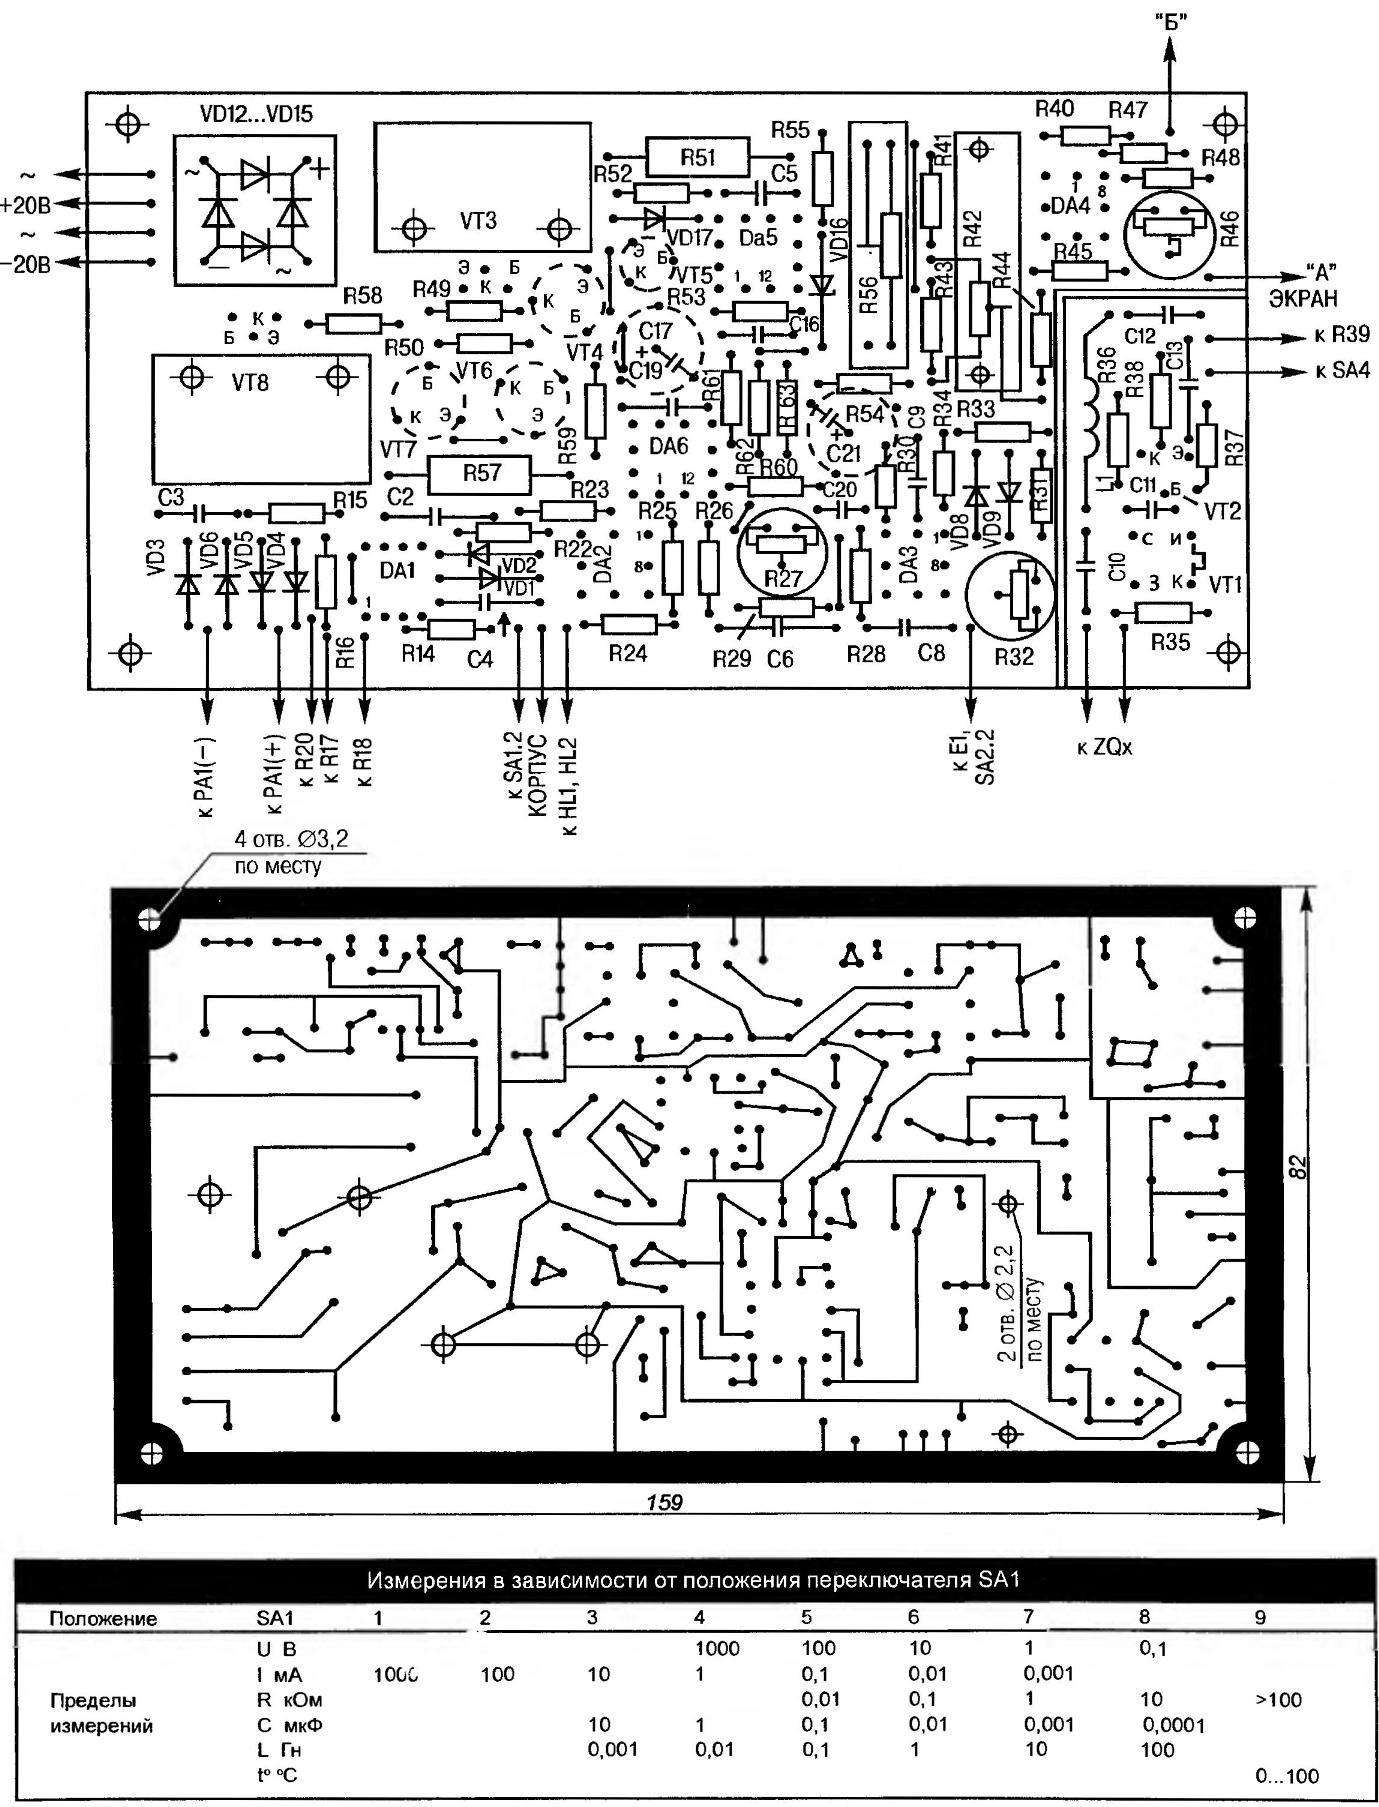 universal printed circuit board